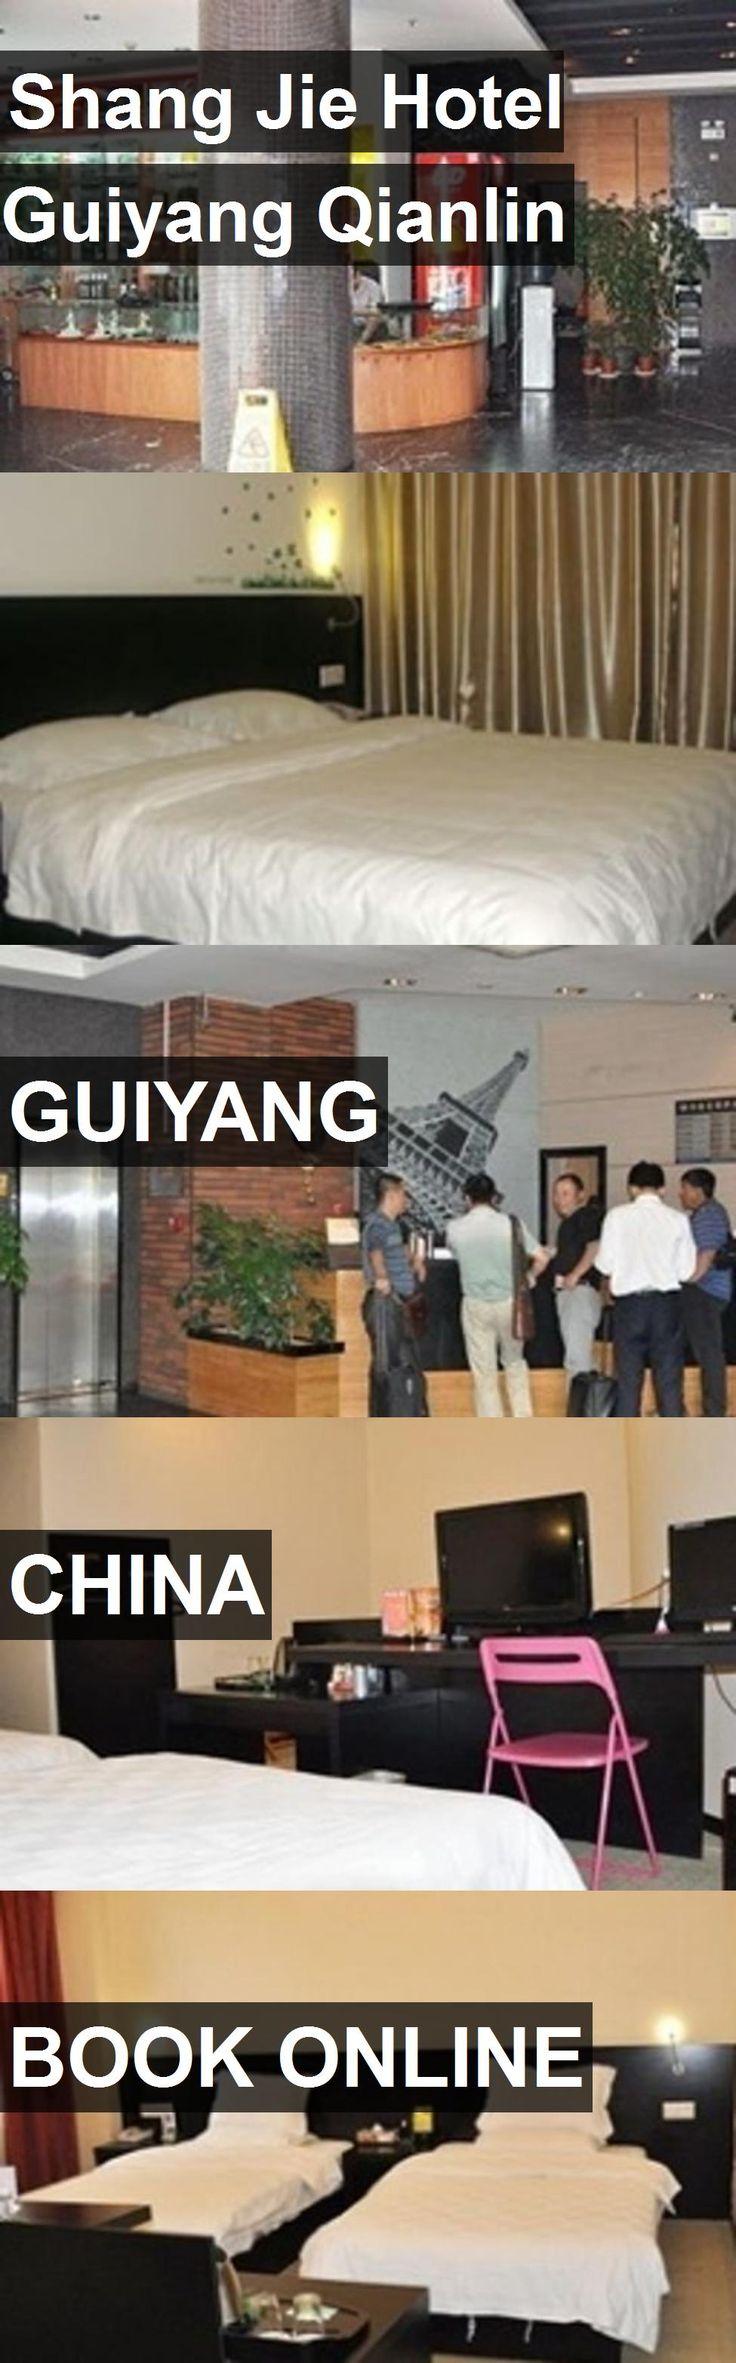 Hotel Shang Jie Hotel Guiyang Qianlin in Guiyang, China. For more information, photos, reviews and best prices please follow the link. #China #Guiyang #hotel #travel #vacation